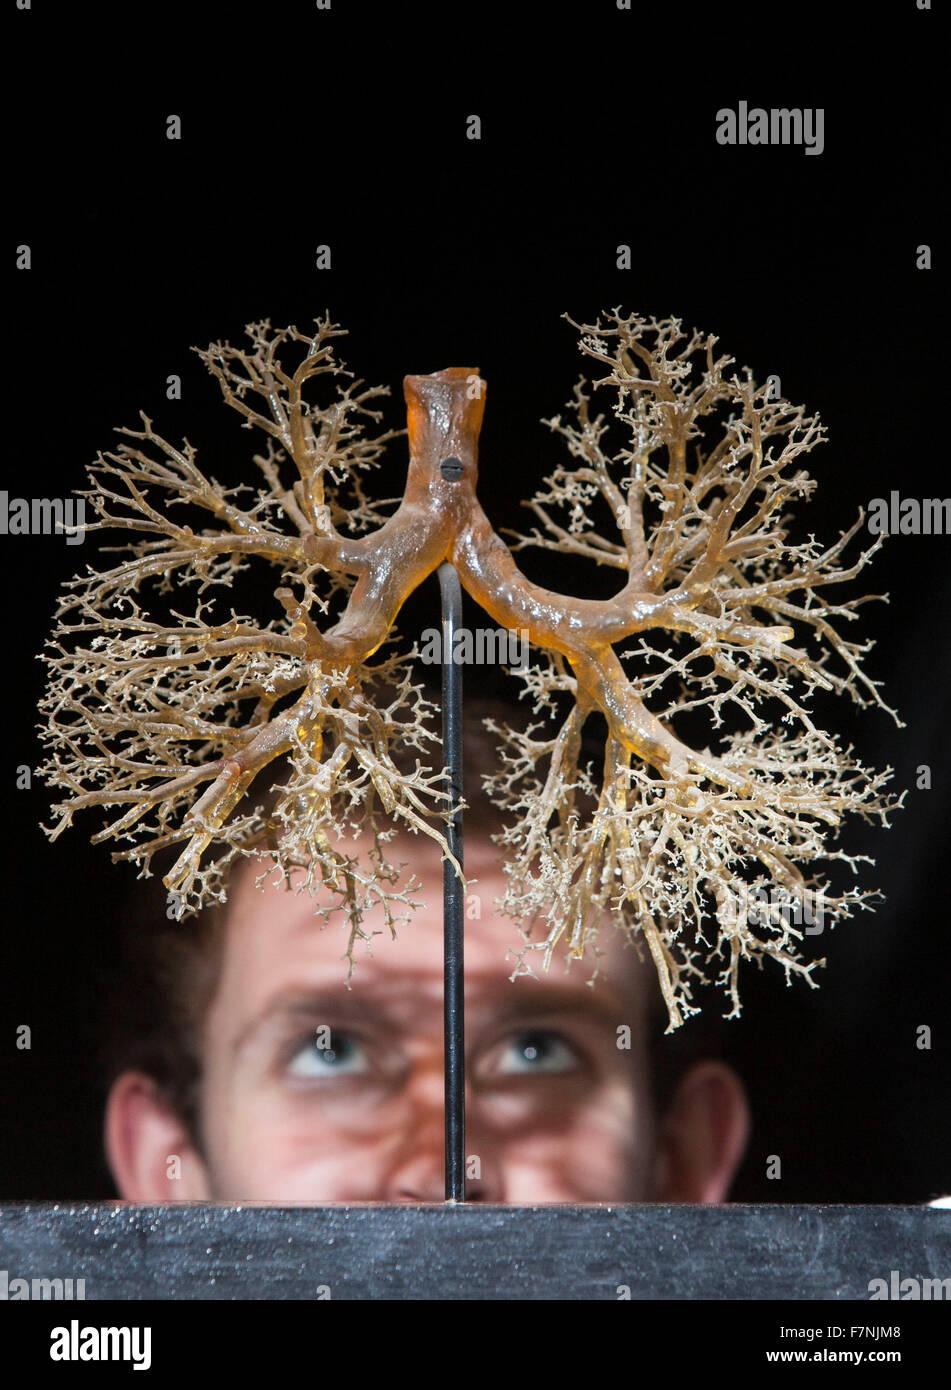 Edinburgh, UK. 2. Dezember. Anatomie-Ausstellung beleuchtet ...